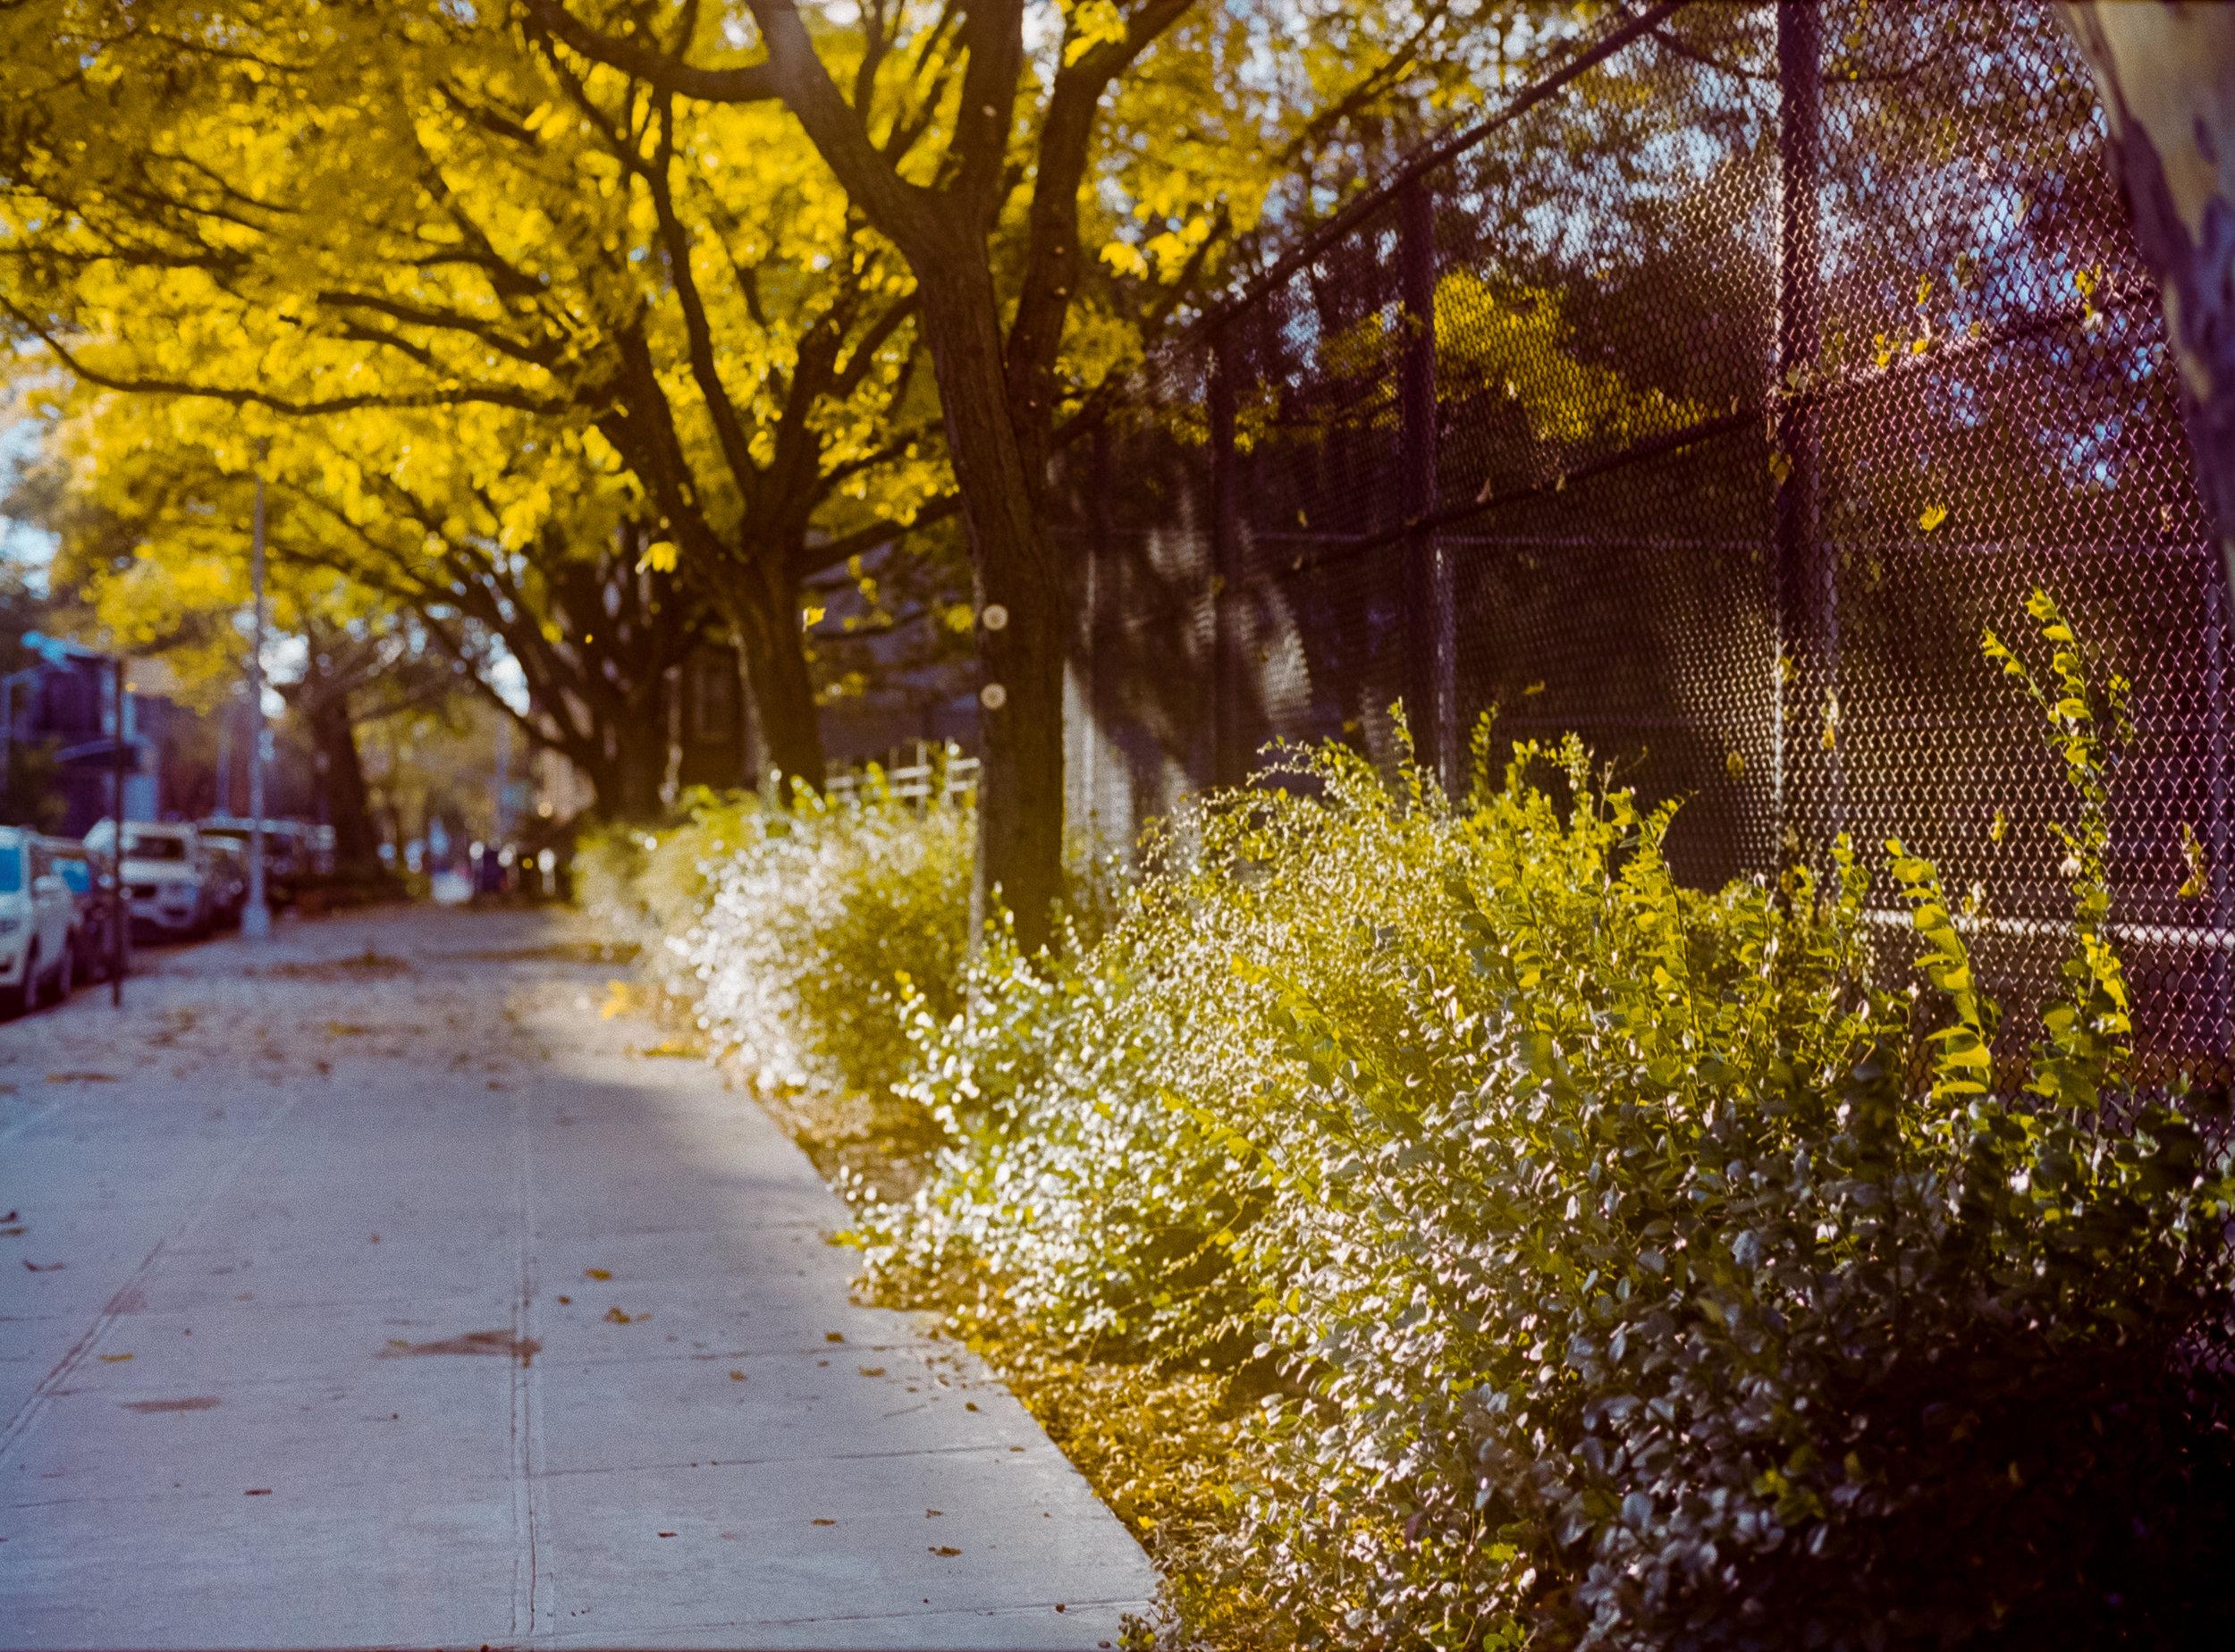 Medium Format | Ektar 100 | Brooklyn, NY